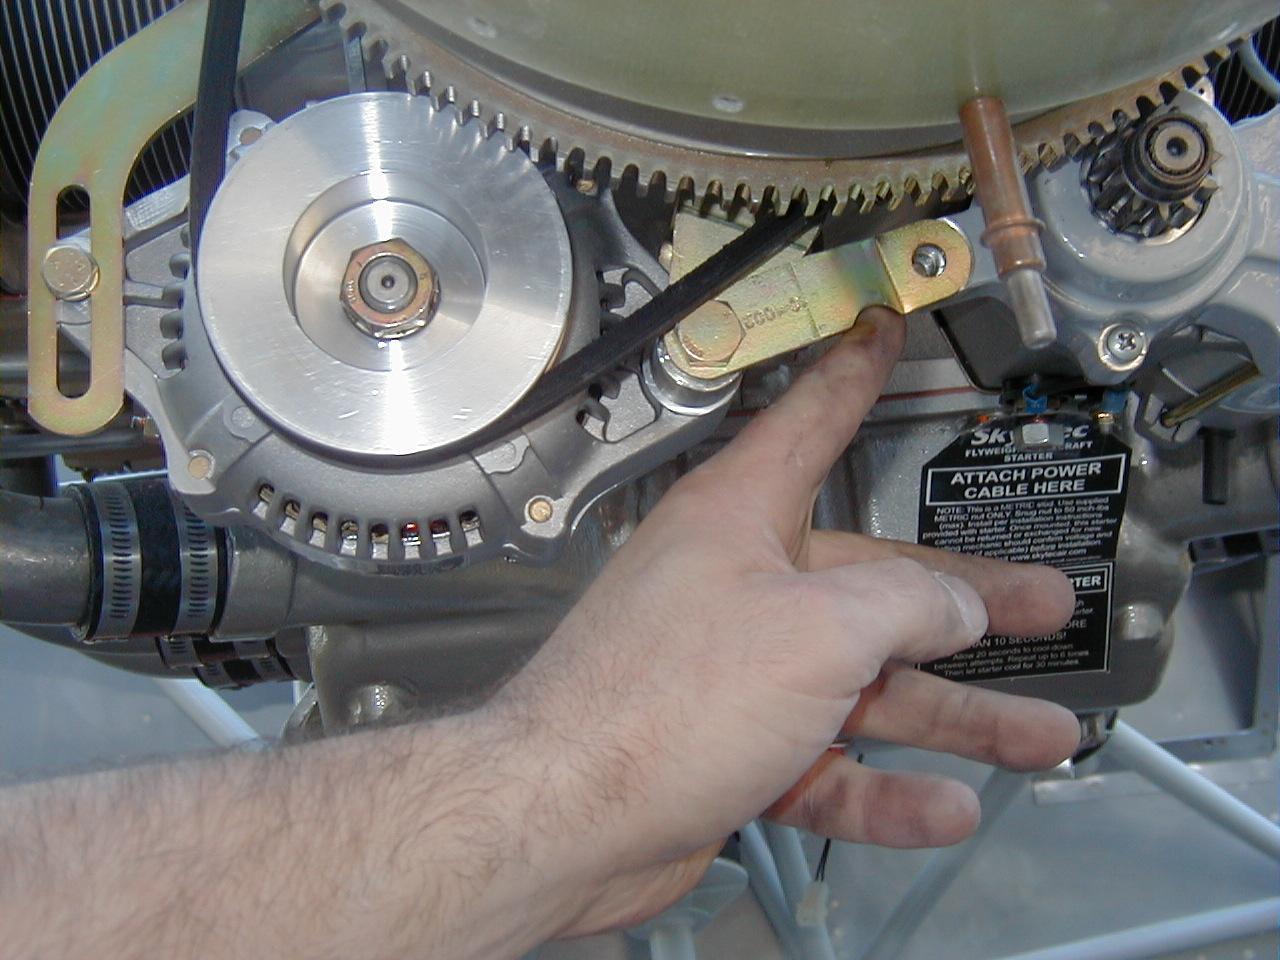 Plane Power Experimental Alternators